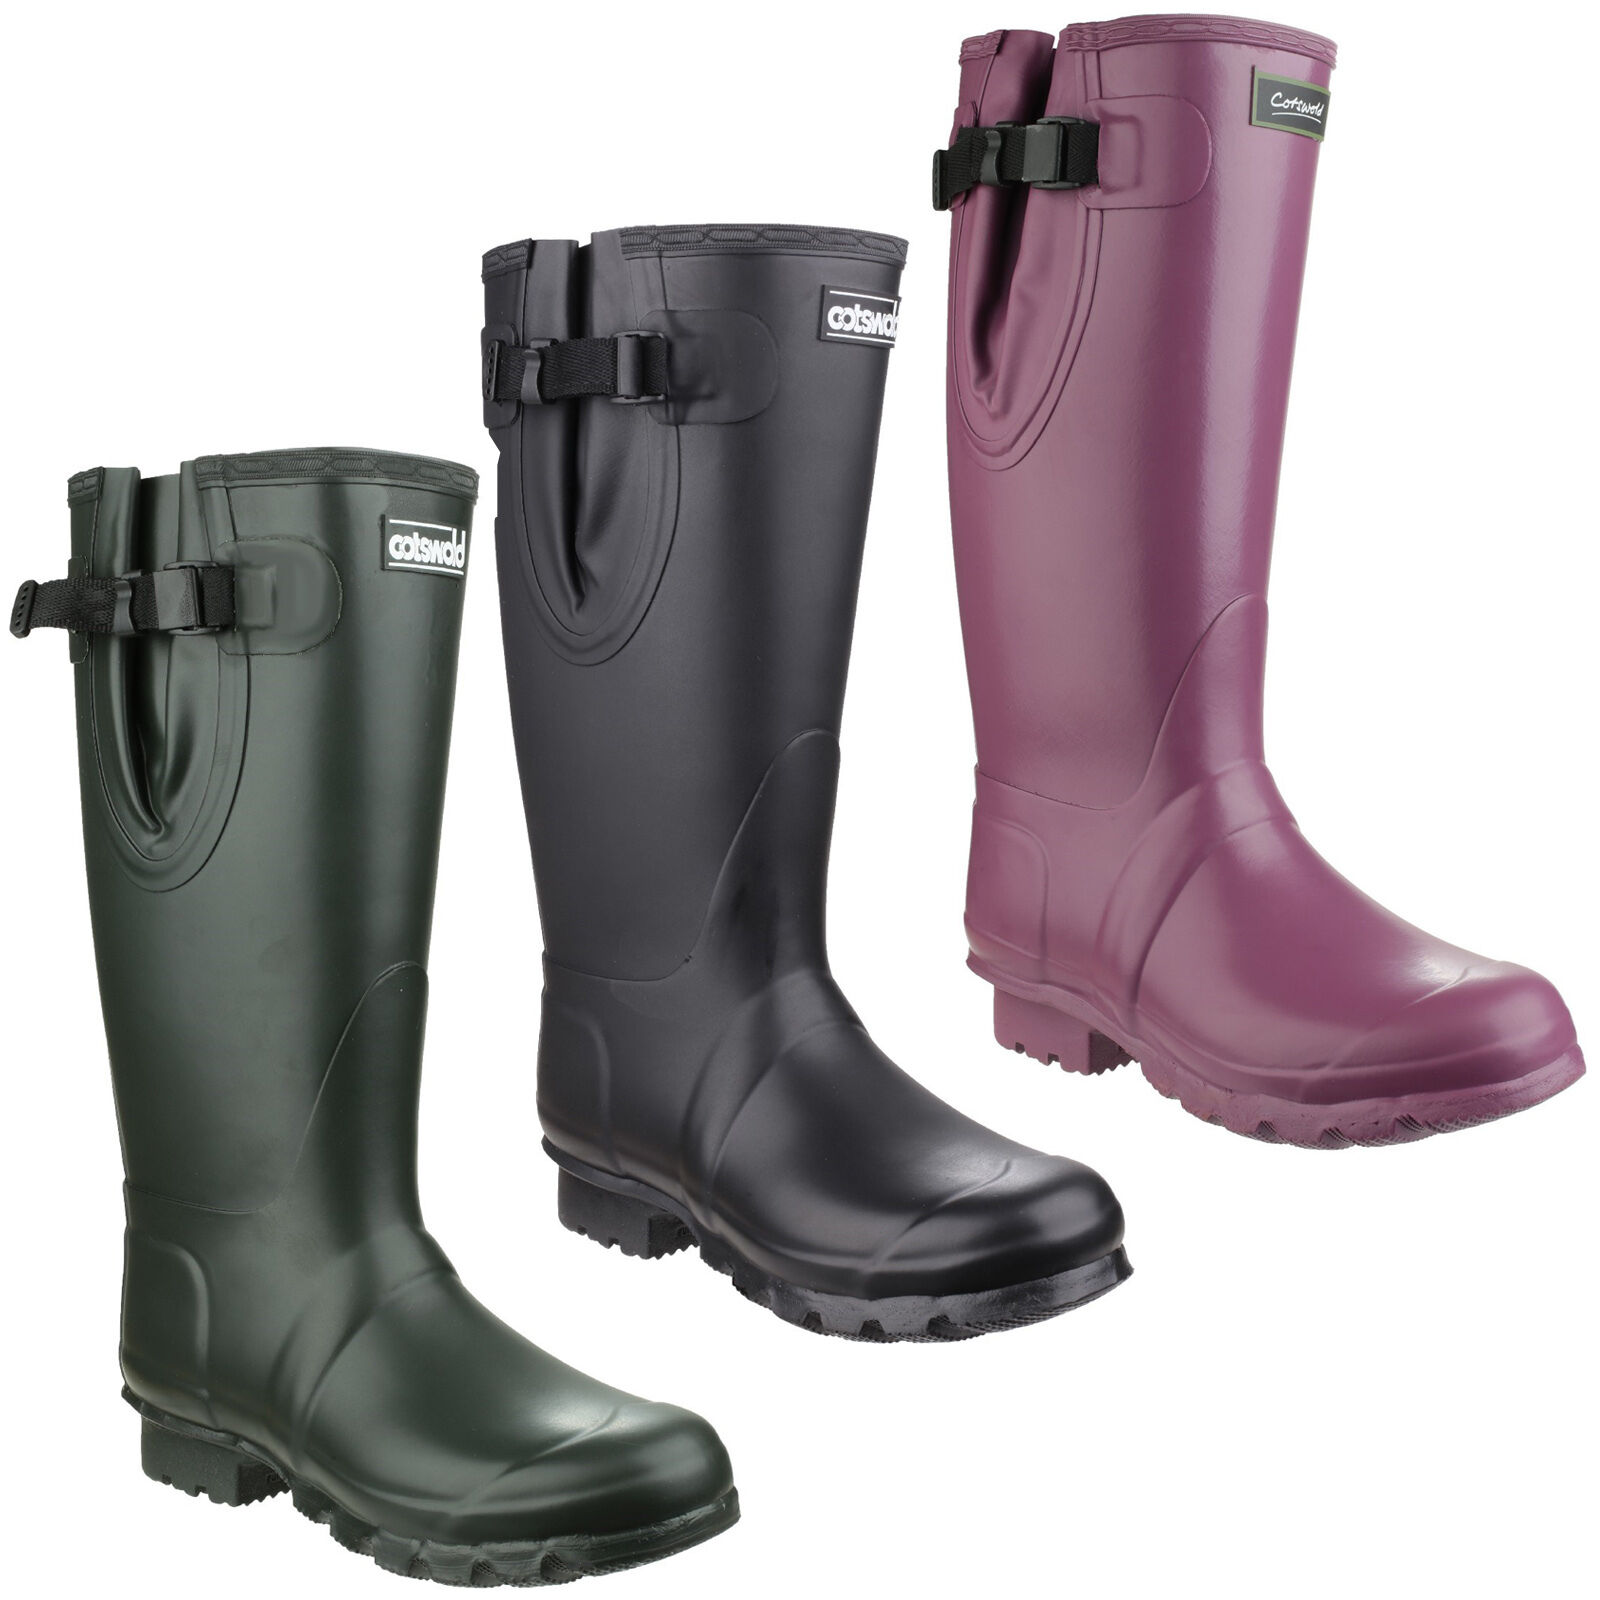 Cotswold KEW Neopreno botas Hombre Niño Impermeable botas de agua uk3-15